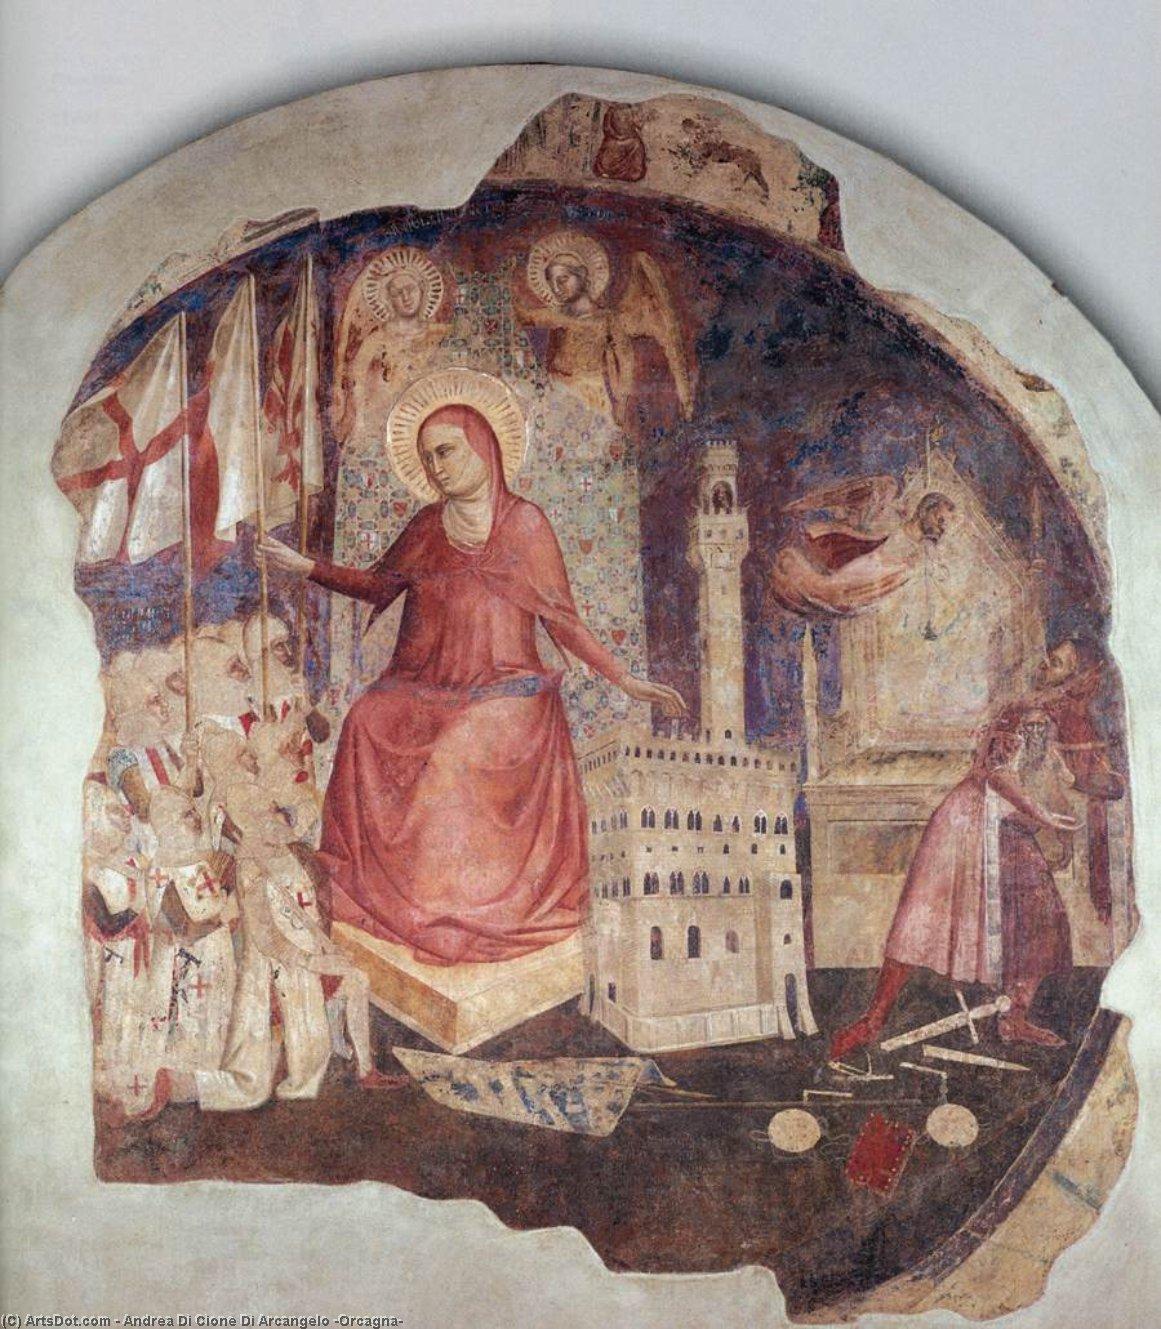 WikiOO.org - Enciklopedija dailės - Tapyba, meno kuriniai Andrea Di Cione Di Arcangelo (Orcagna) - The Expulsion of the Duke of Athens